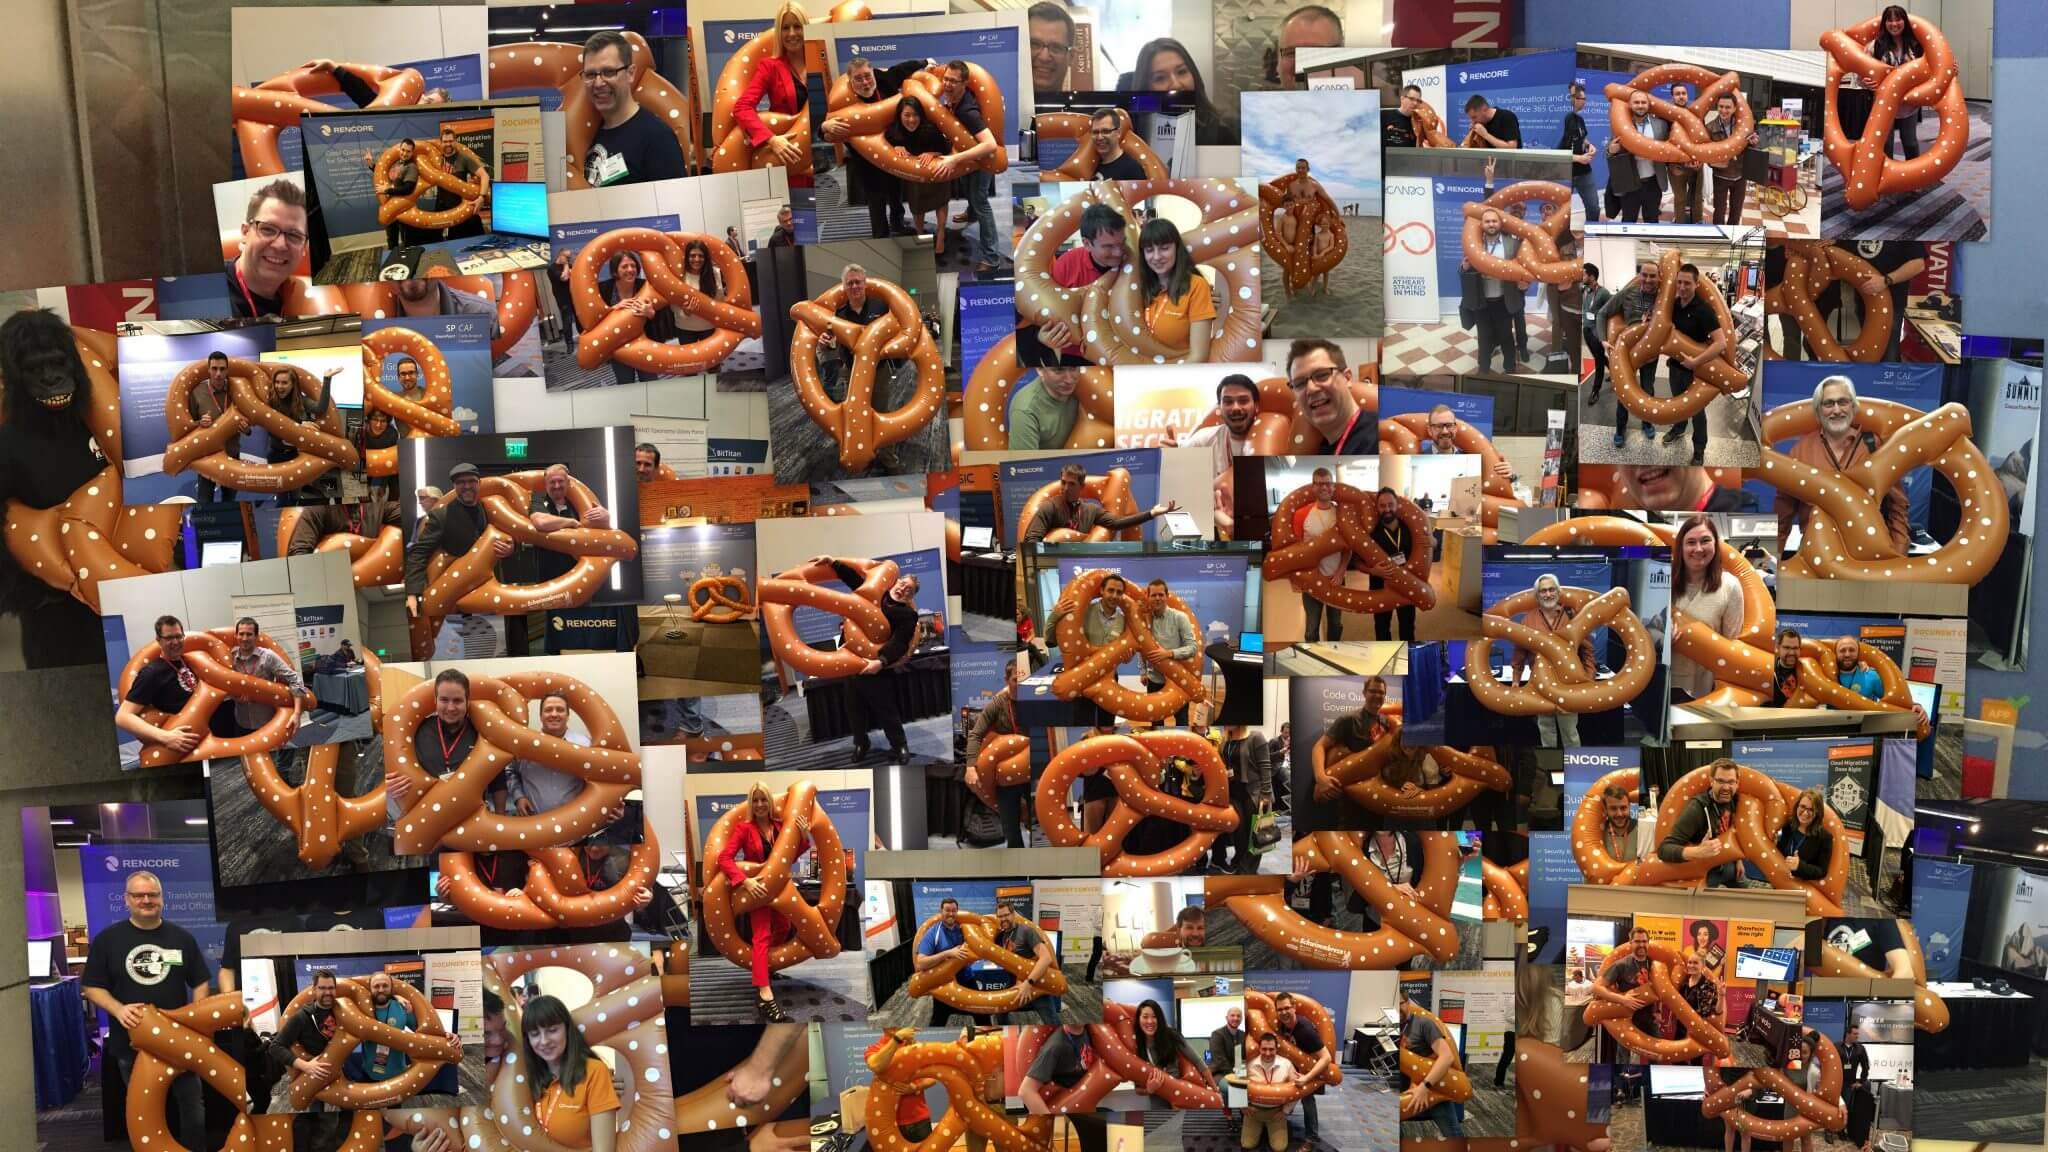 The Rencore pretzel takes center stage in 2016